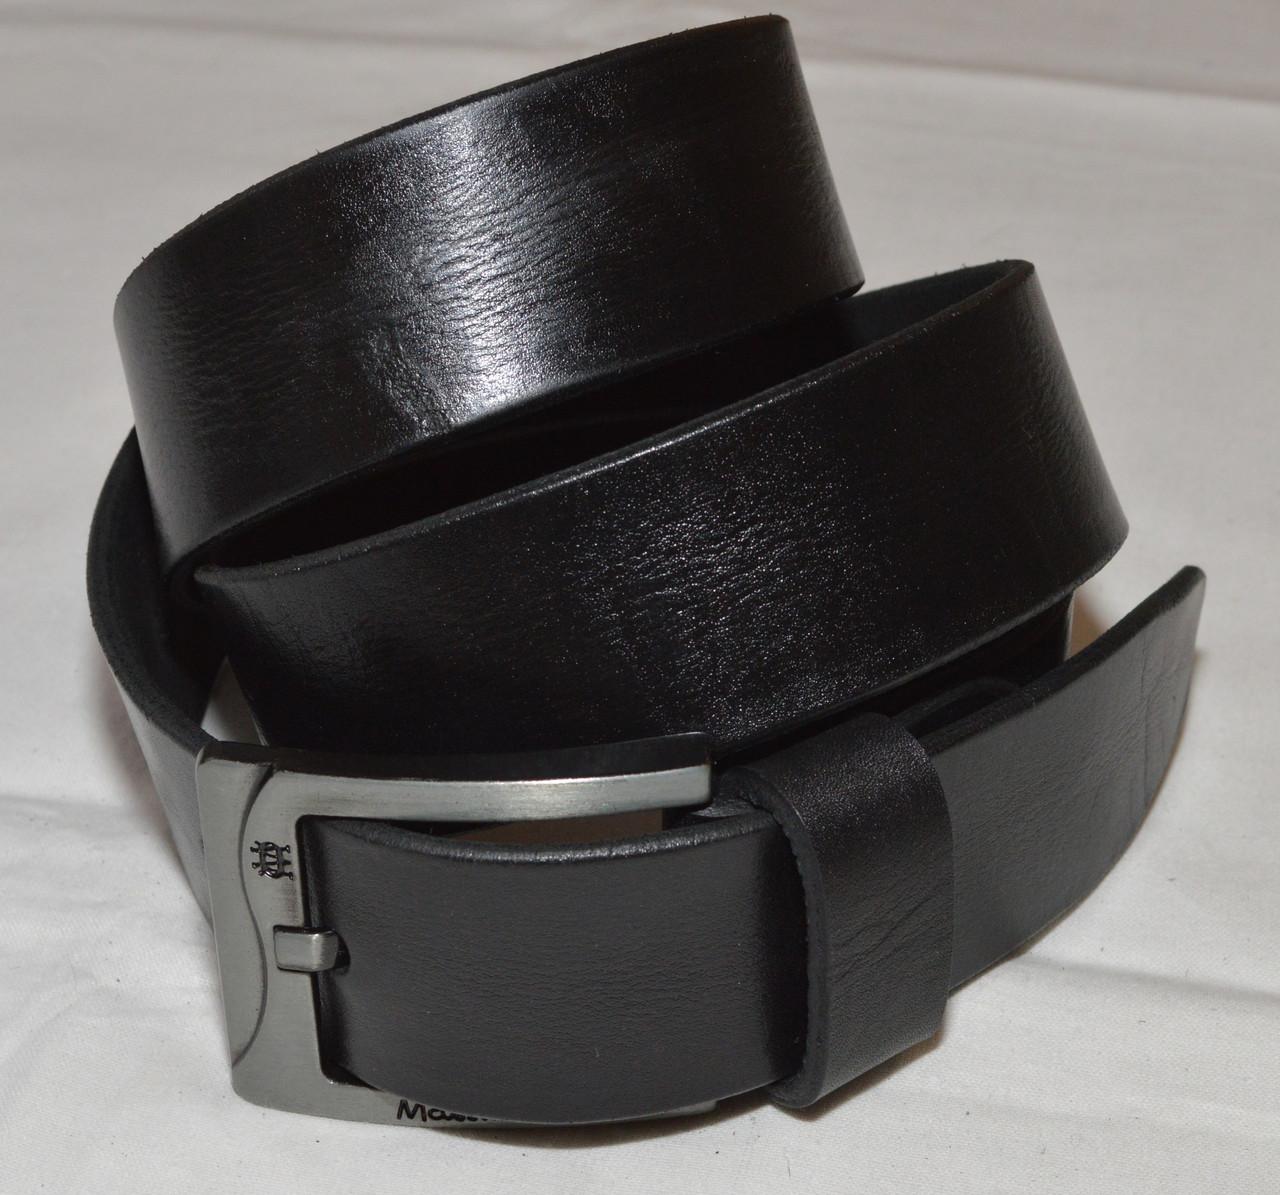 Ремень кожаный Massimo Dutti   555 (копия)